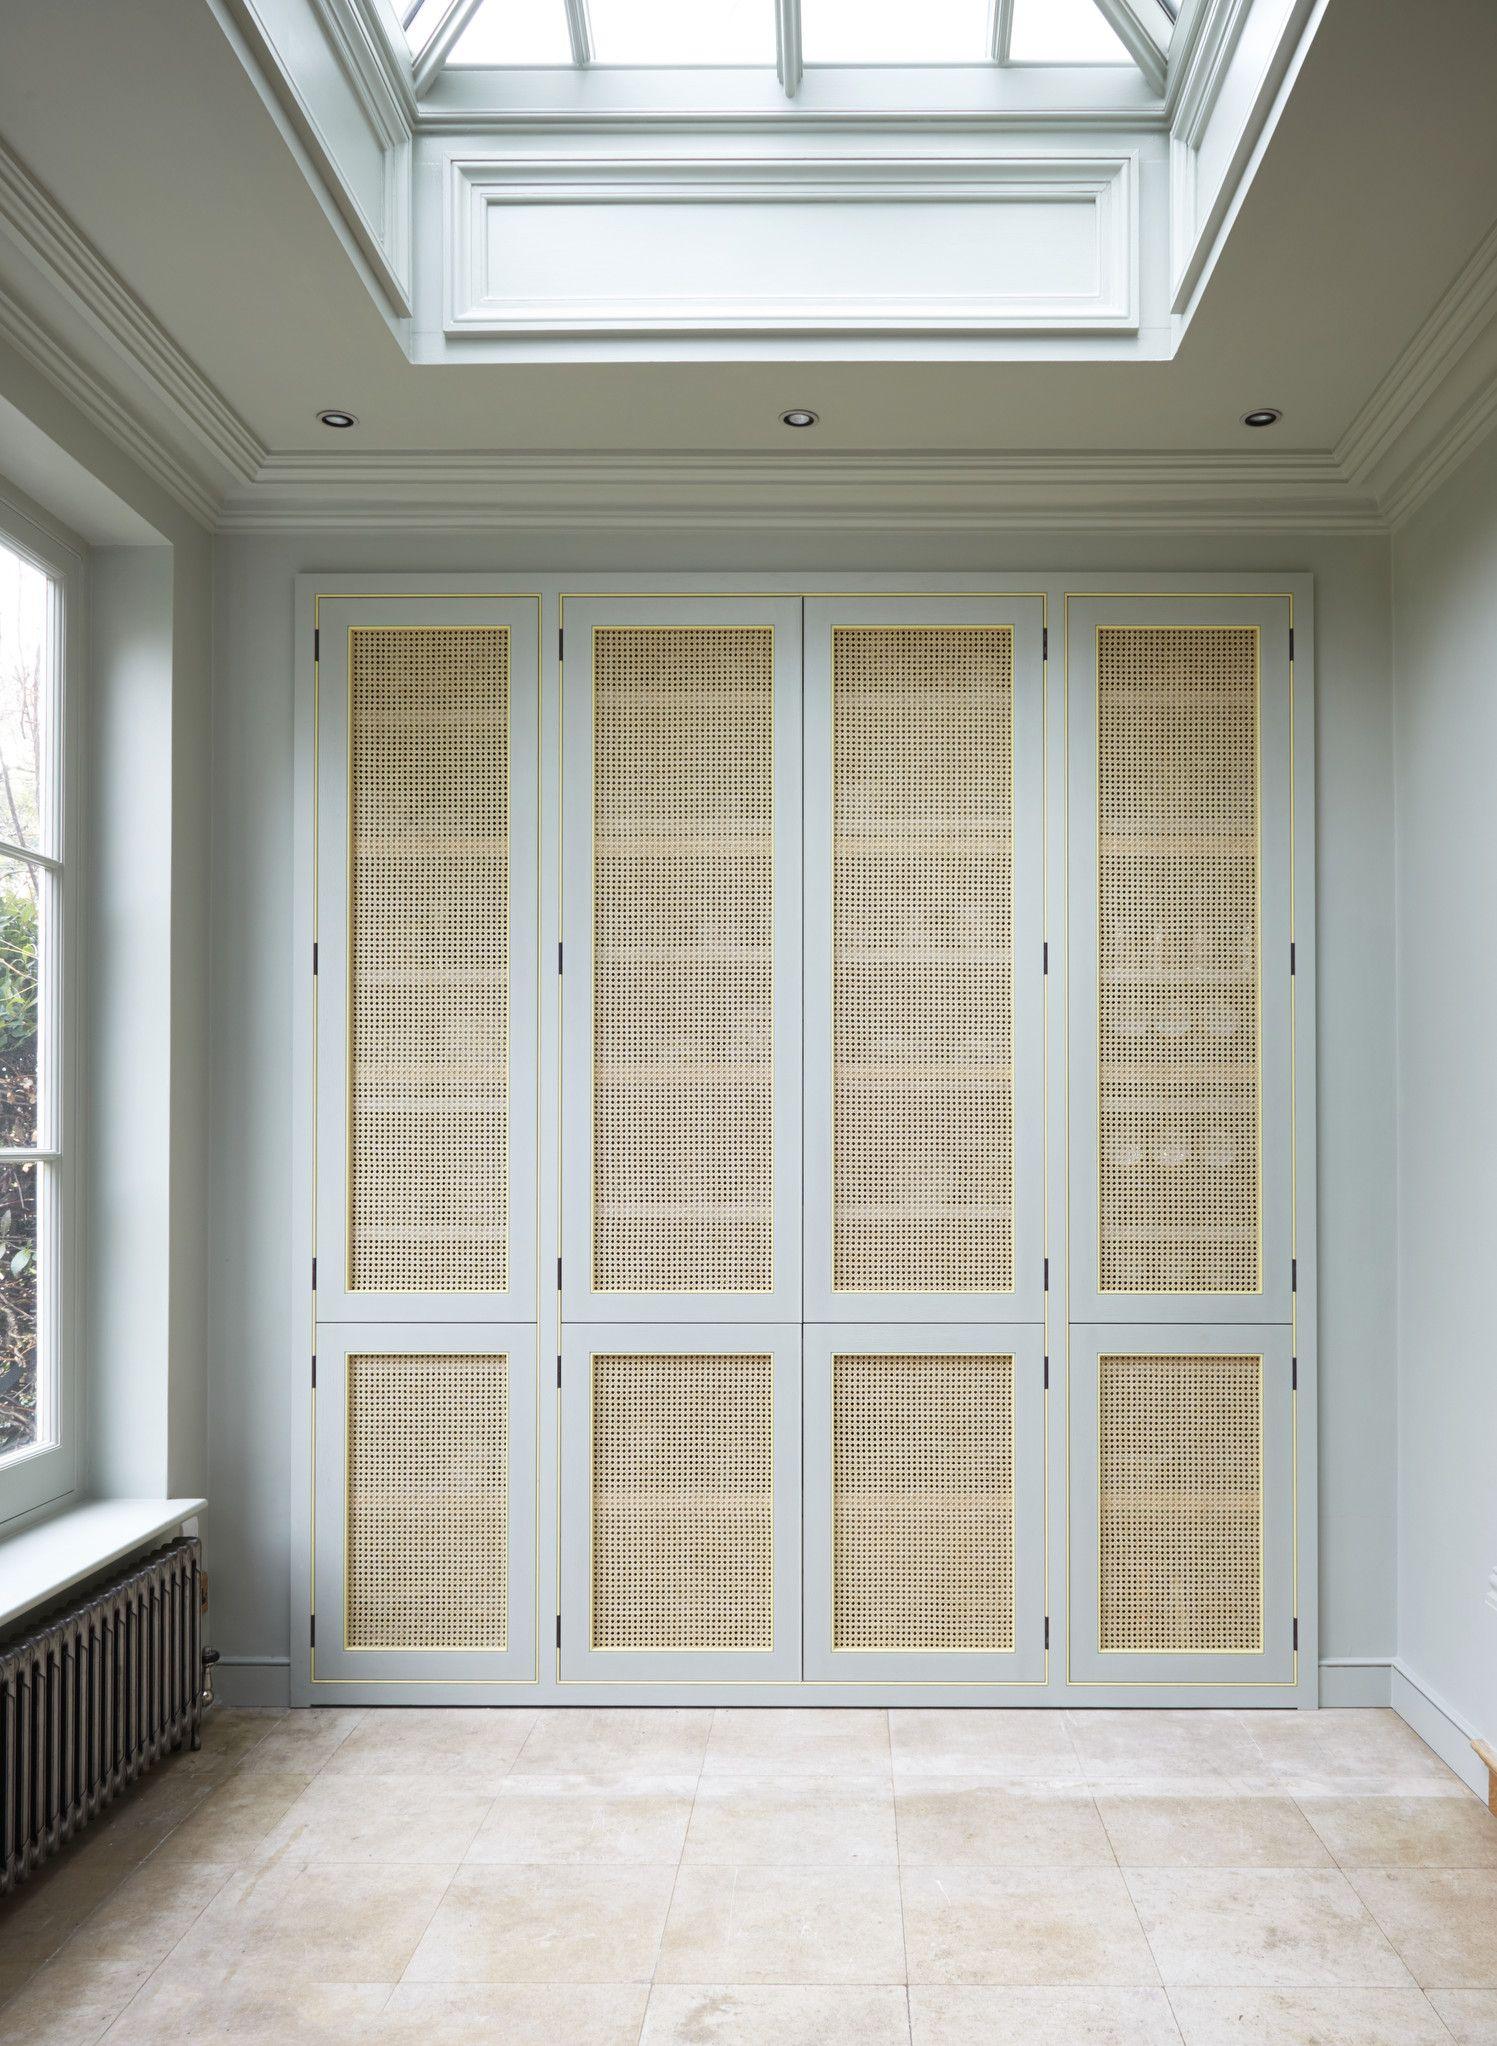 Bespoke Rattan Cupboard Doors By Studio Wilson Copp Home New Homes House